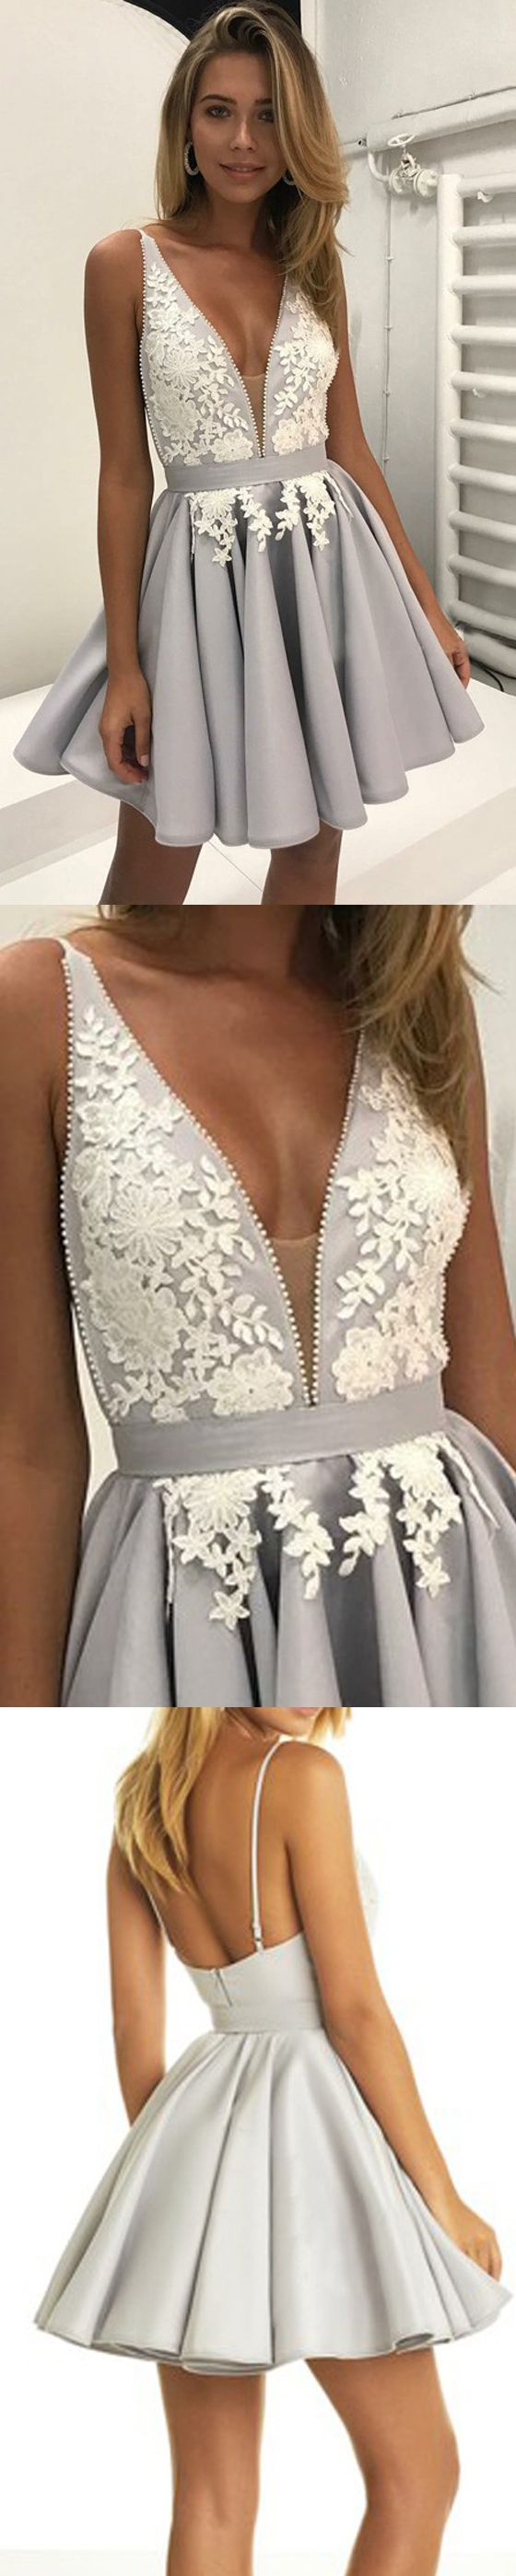 Cute V Neck Lace Grey/Silver Cheap Short Homecoming Dresses, WG810 #homecoming #homecomingdress #school #graduation #dress